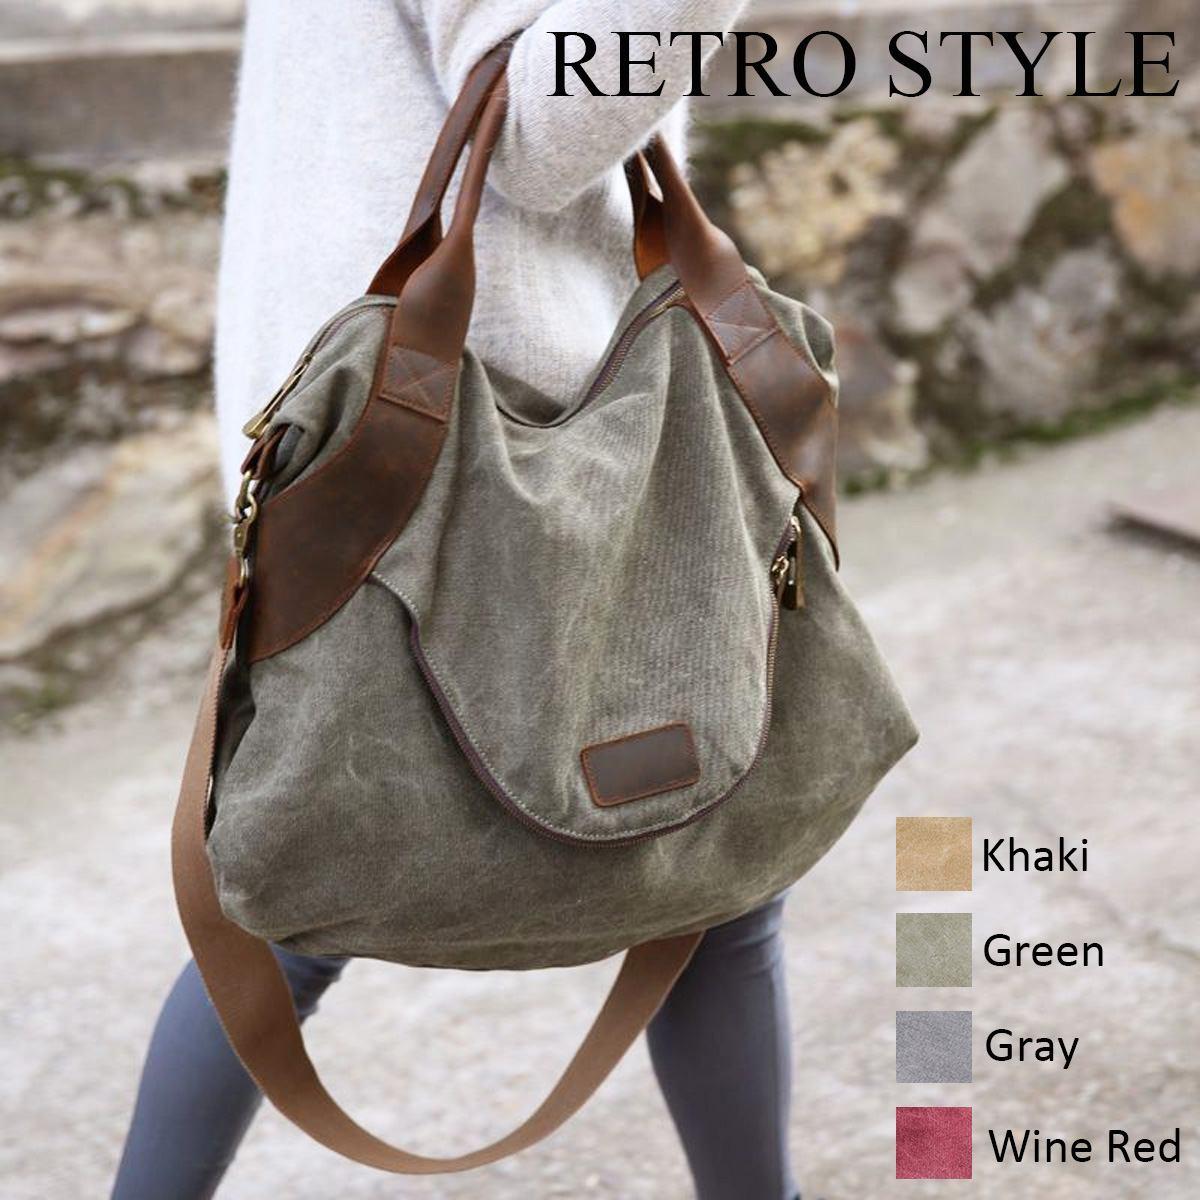 Large Pockets Casual Tote Womens Handbag Shoulder Handbags Canvas Leather Capacity Bags For WomenLarge Pockets Casual Tote Womens Handbag Shoulder Handbags Canvas Leather Capacity Bags For Women